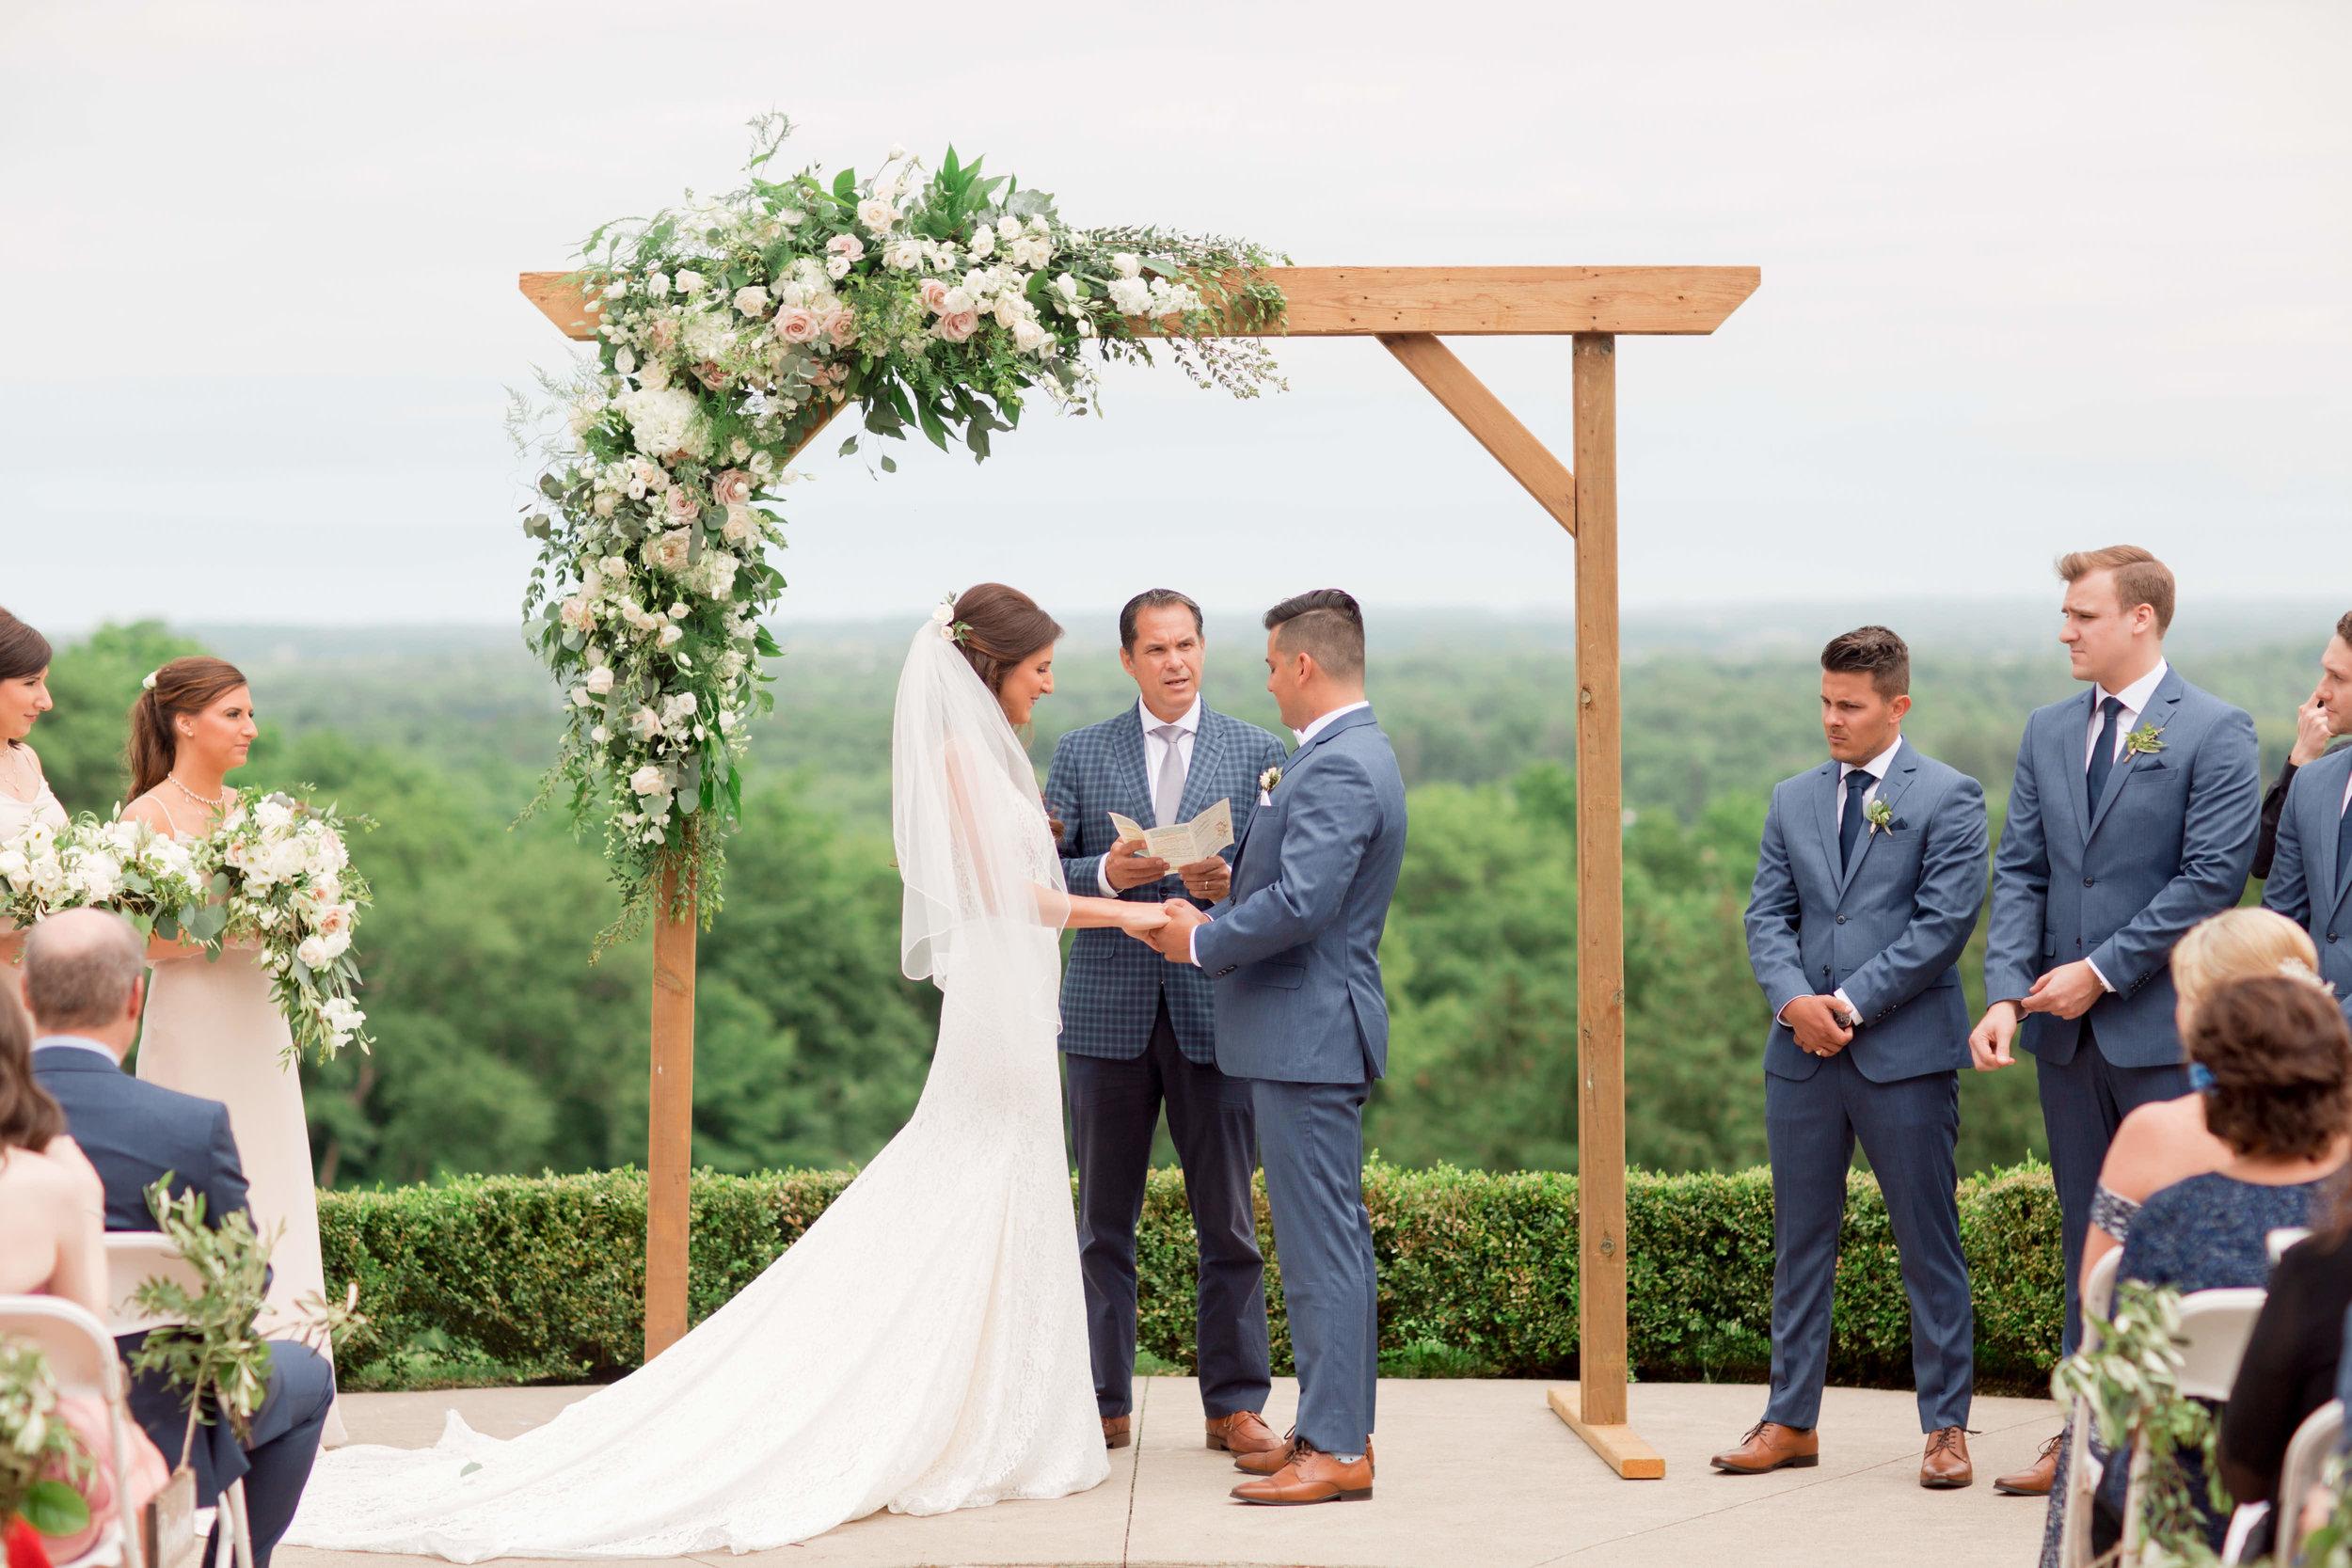 Miranda___Daniel___Daniel_Ricci_Weddings___High_Res._Finals_100.jpg